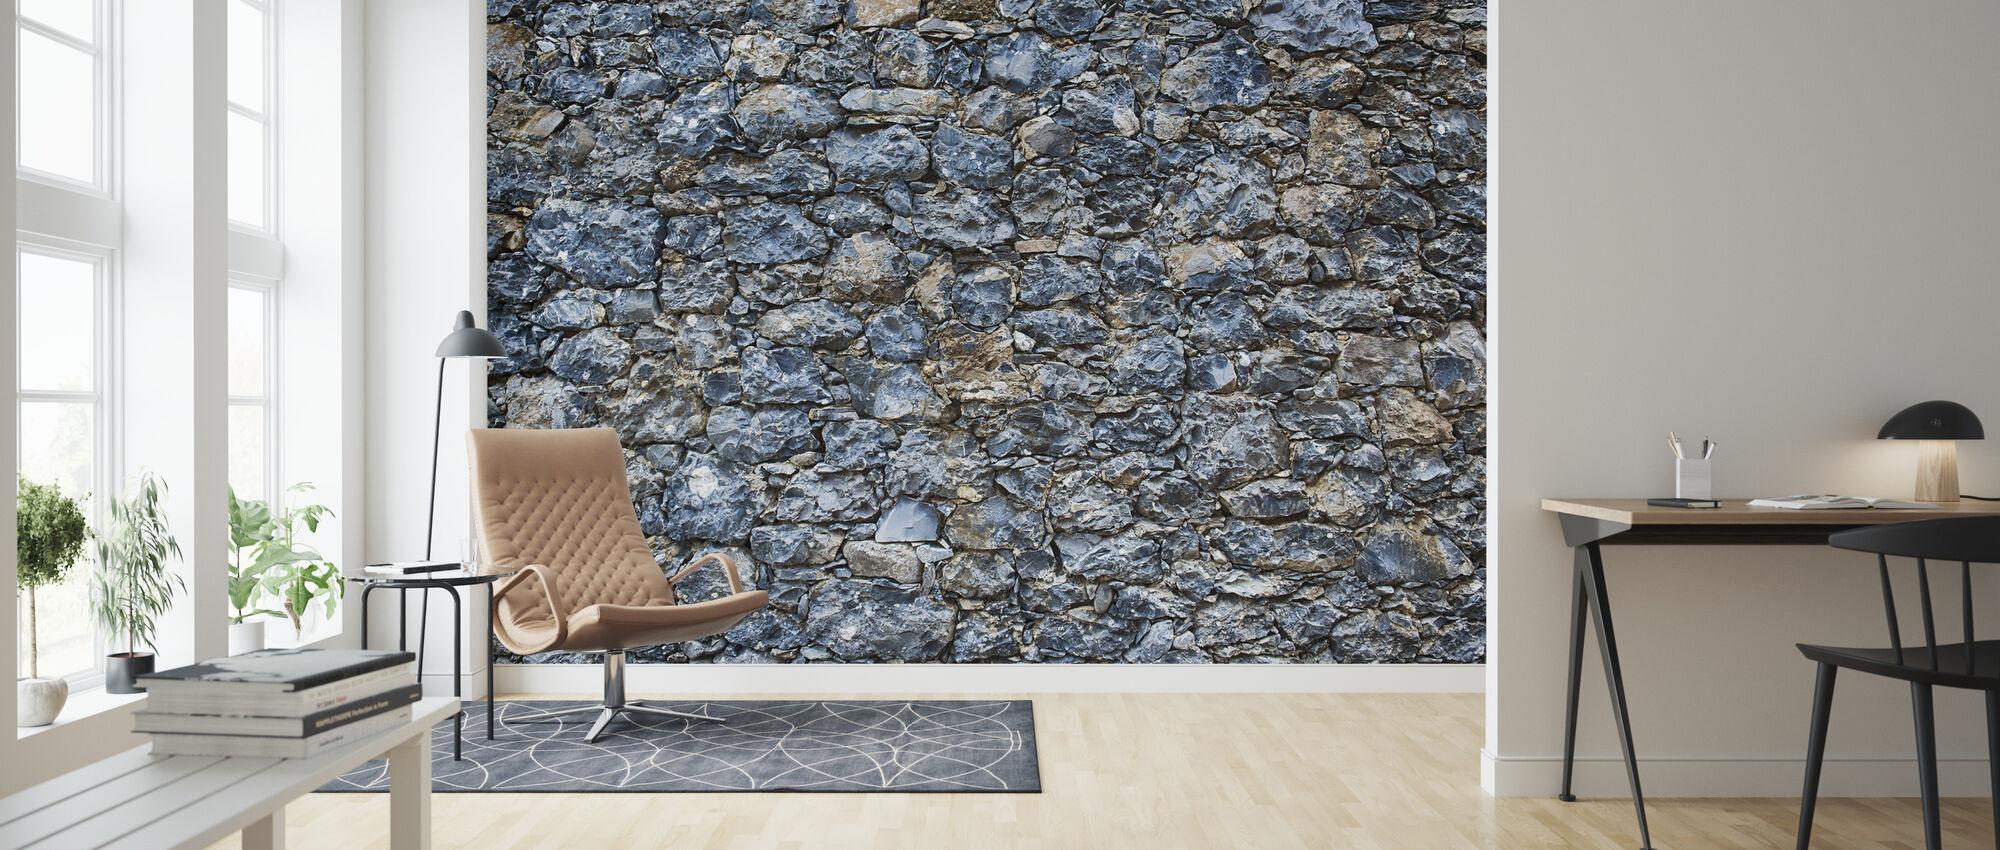 Blue Stone Wall - Wallpaper - Living Room